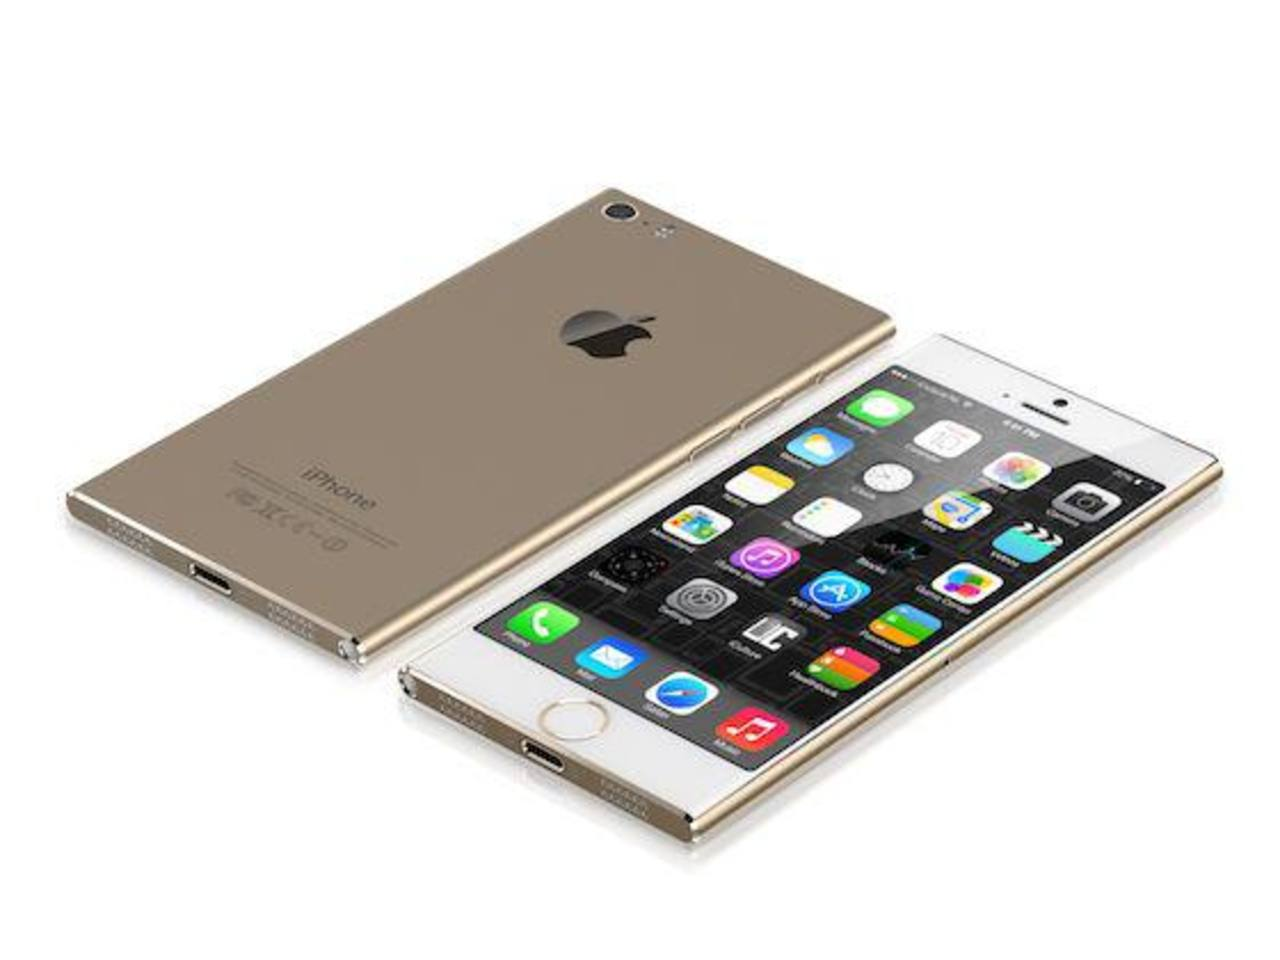 El iPhone 6 tendrá una pantalla de zafiro casi indestructible, según medios